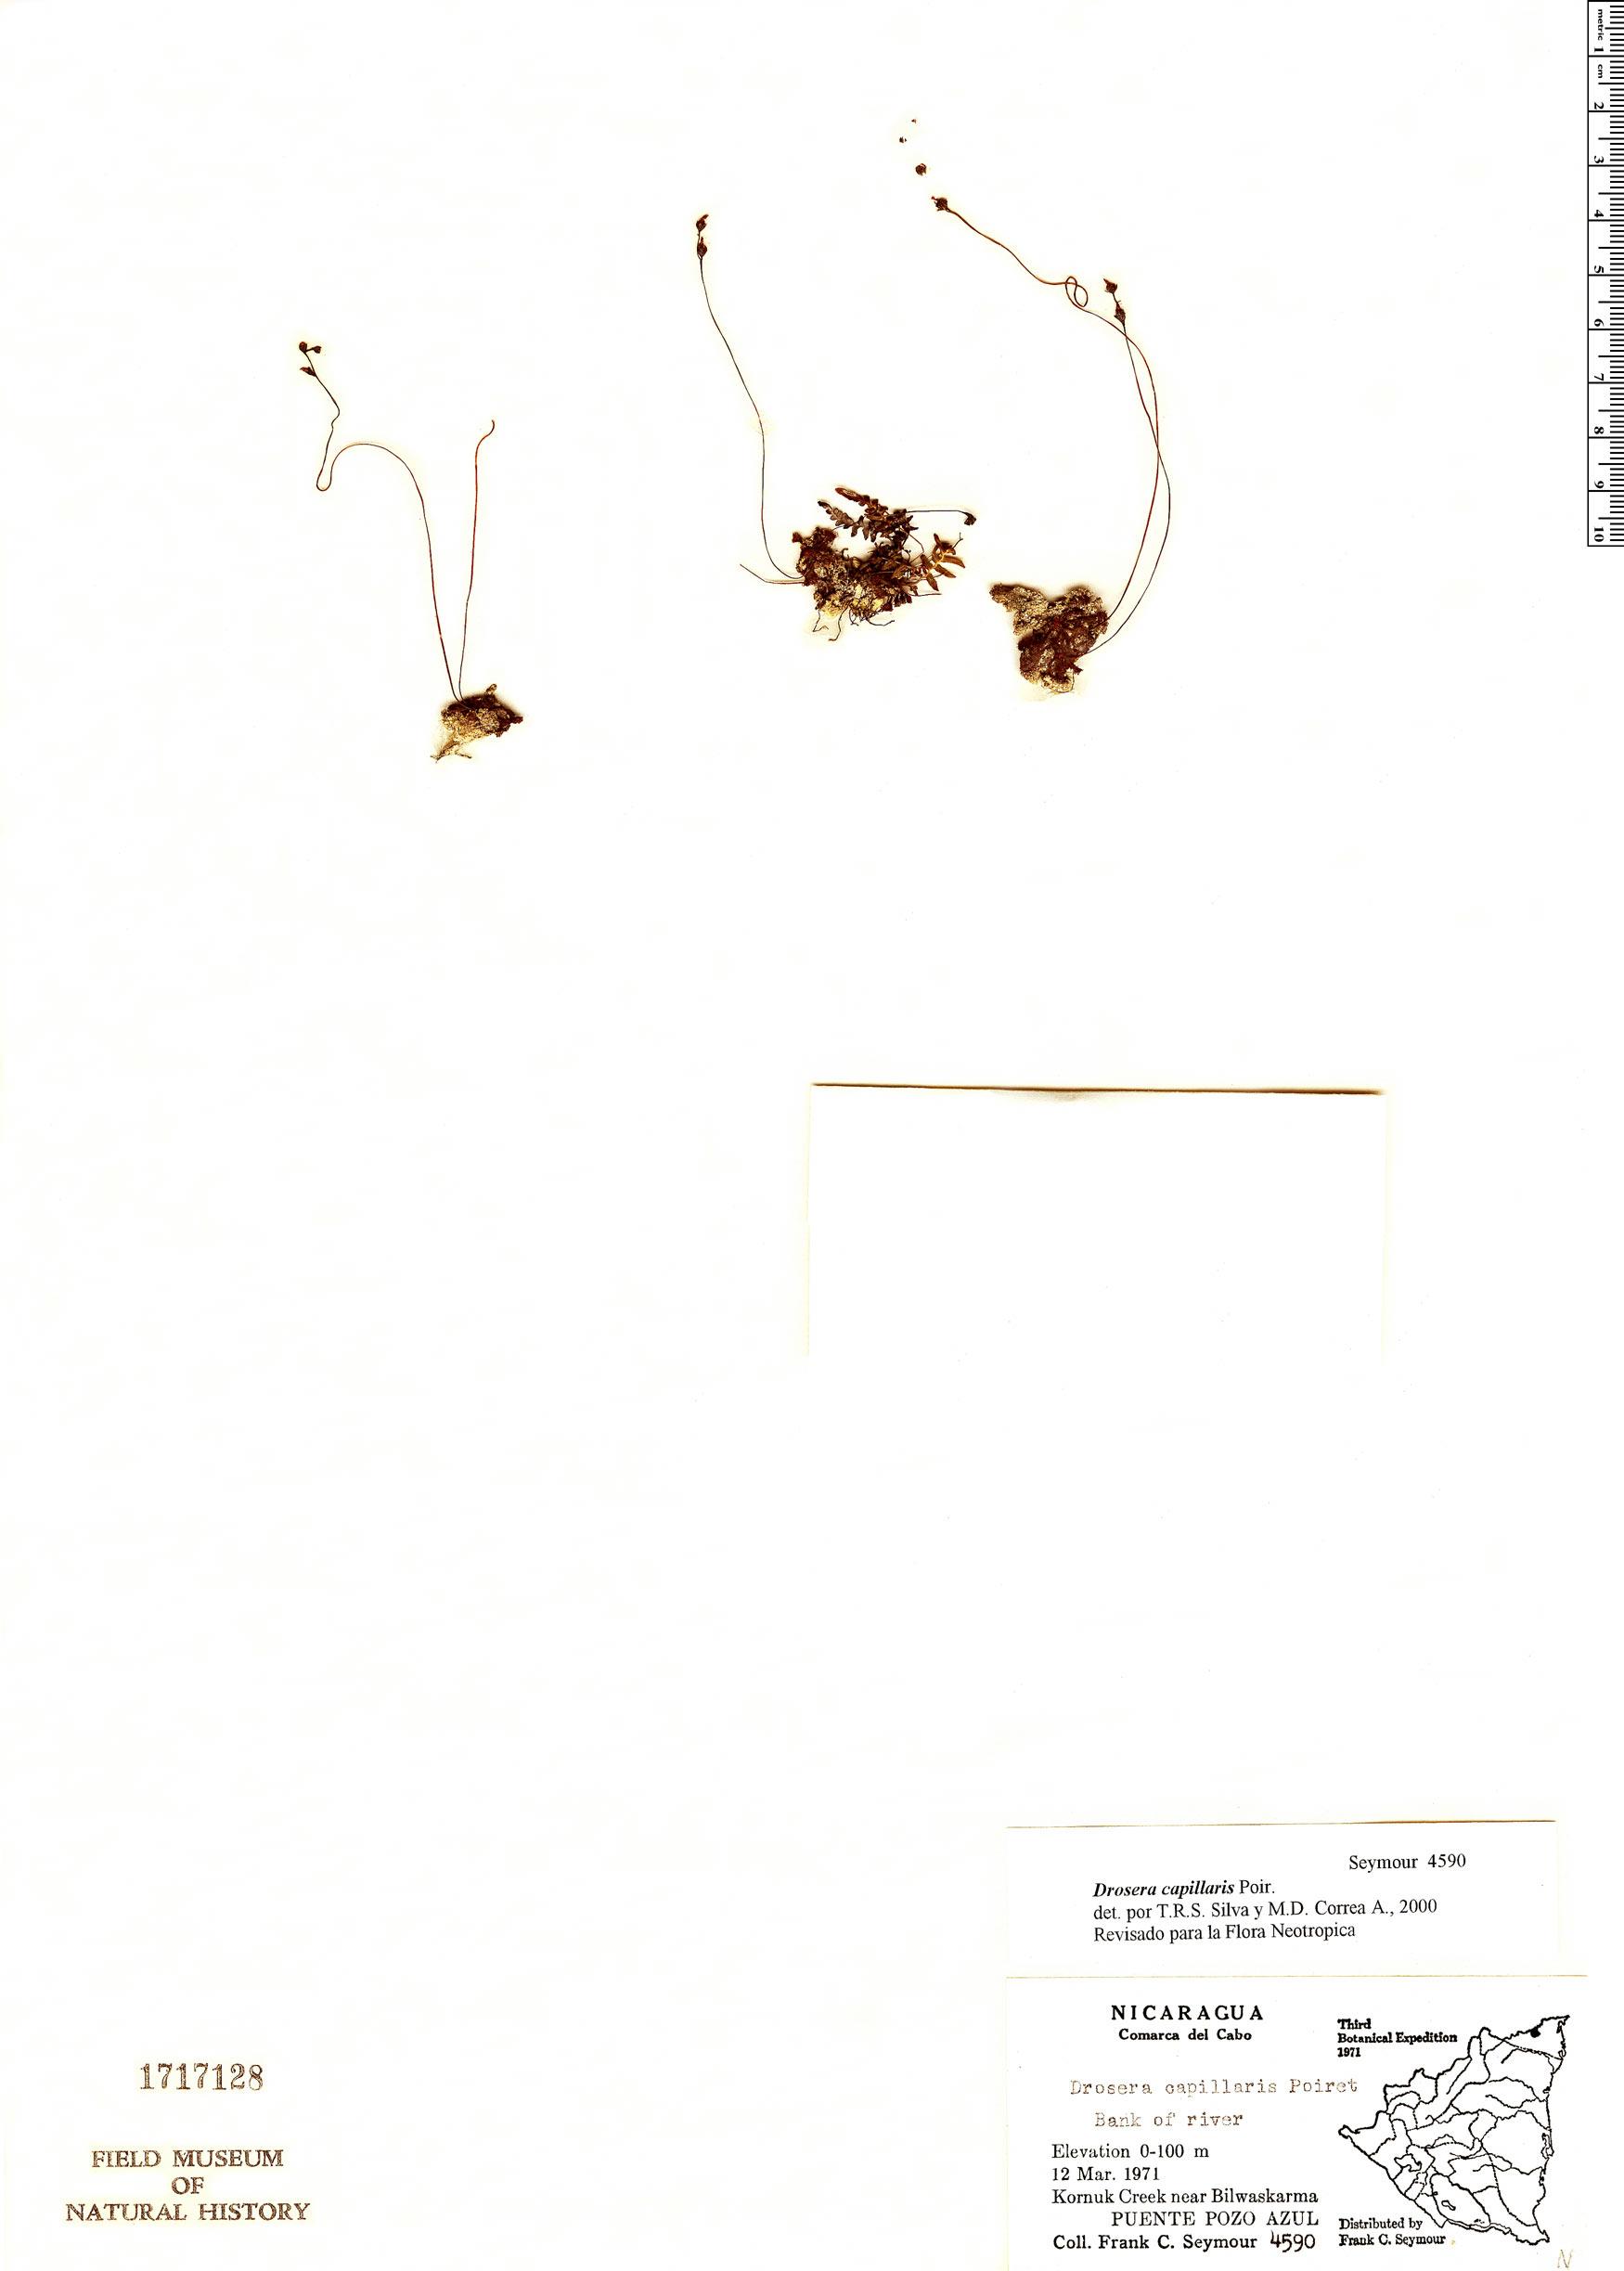 Specimen: Drosera capillaris